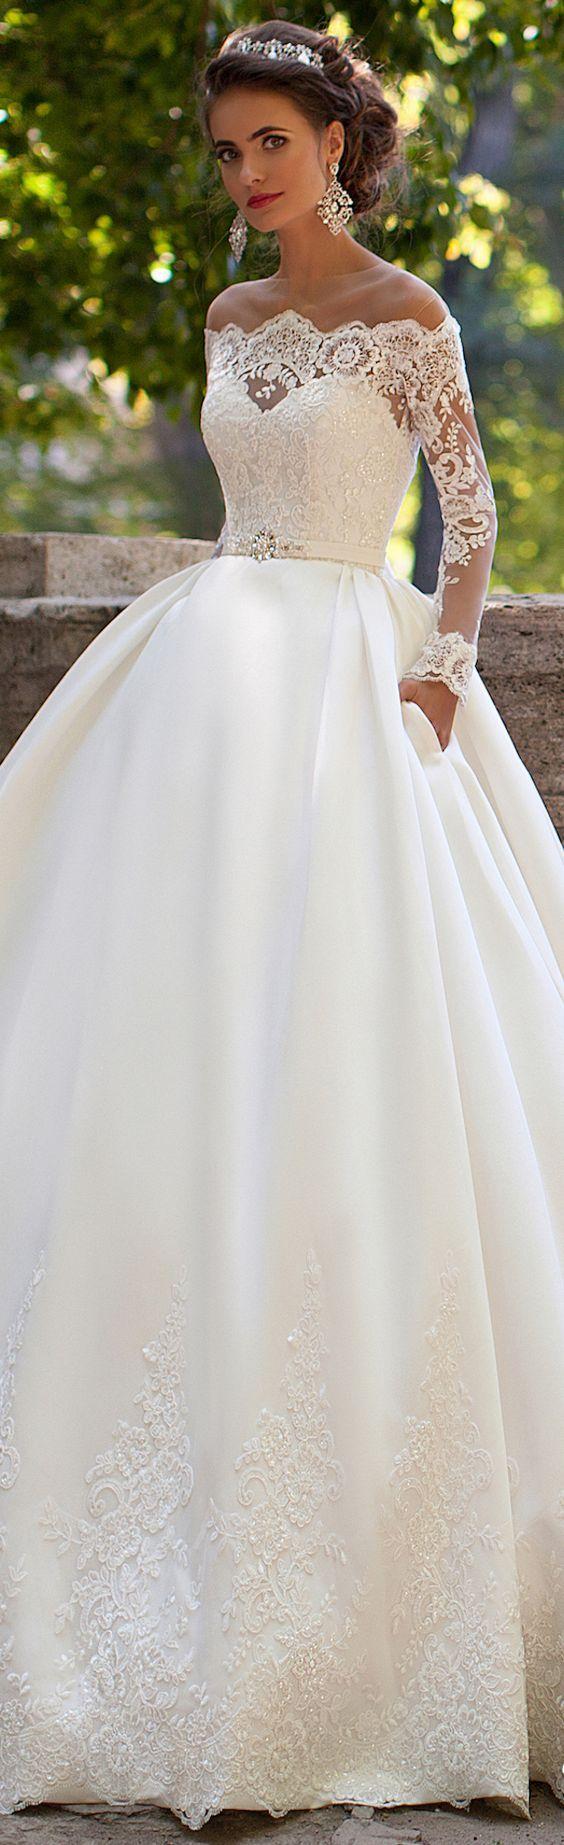 vestidos noiva fantastico